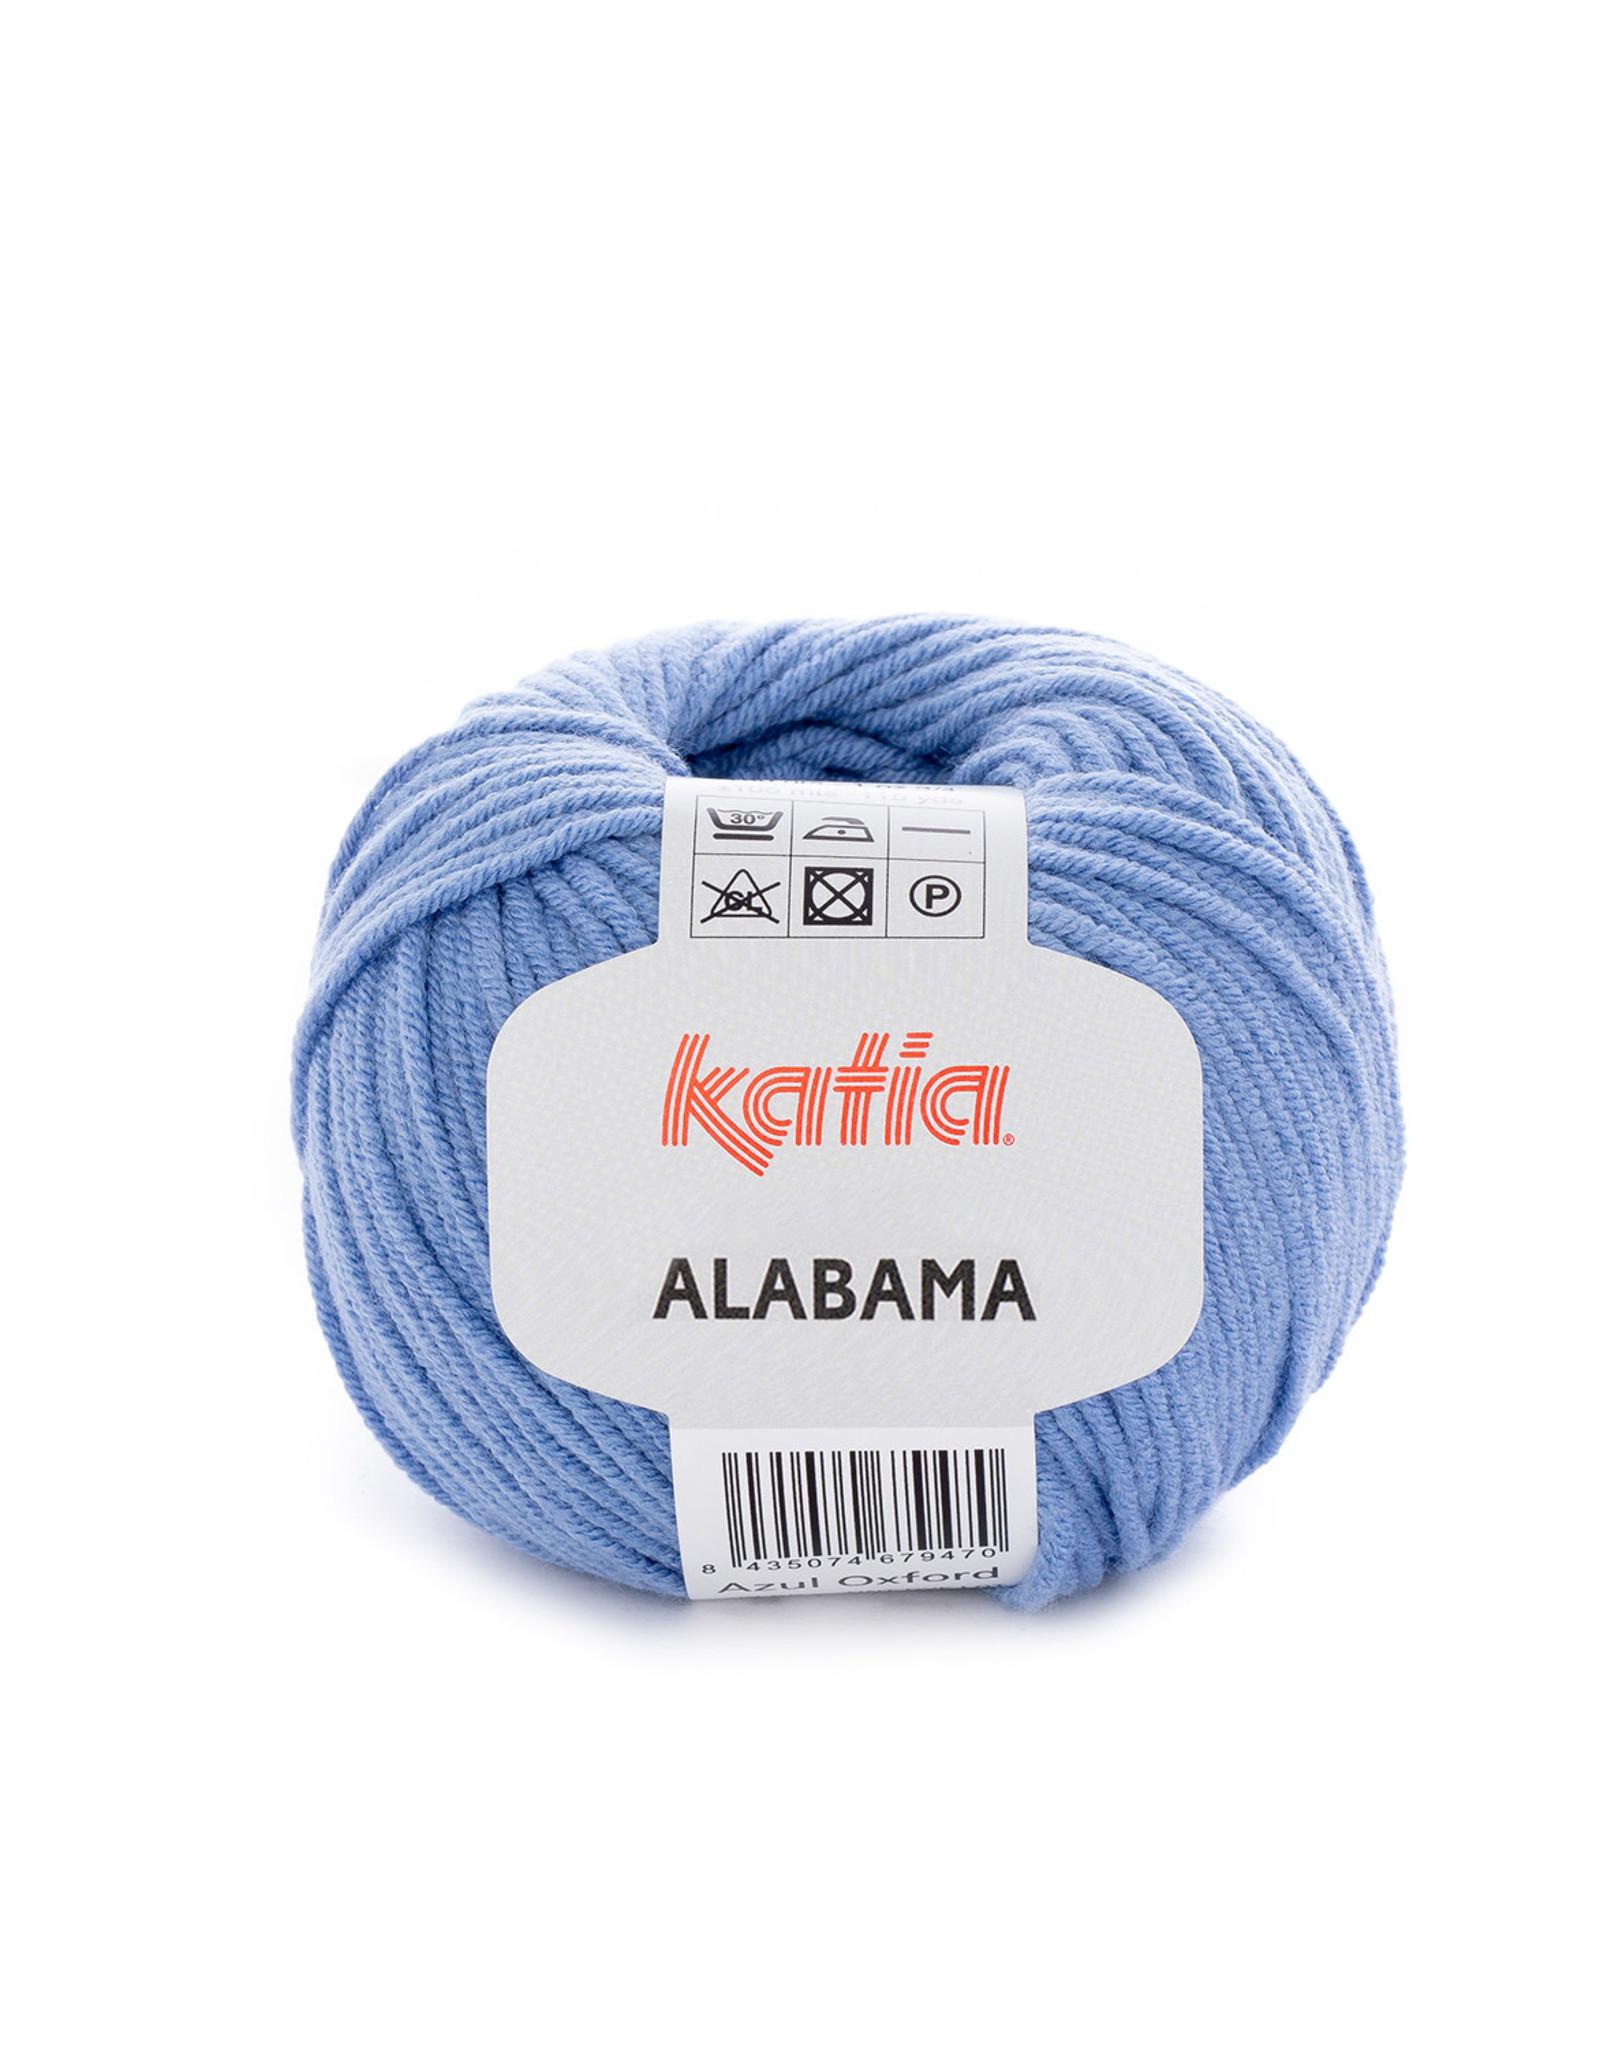 Katia Katia Alabama 14 medium blauw